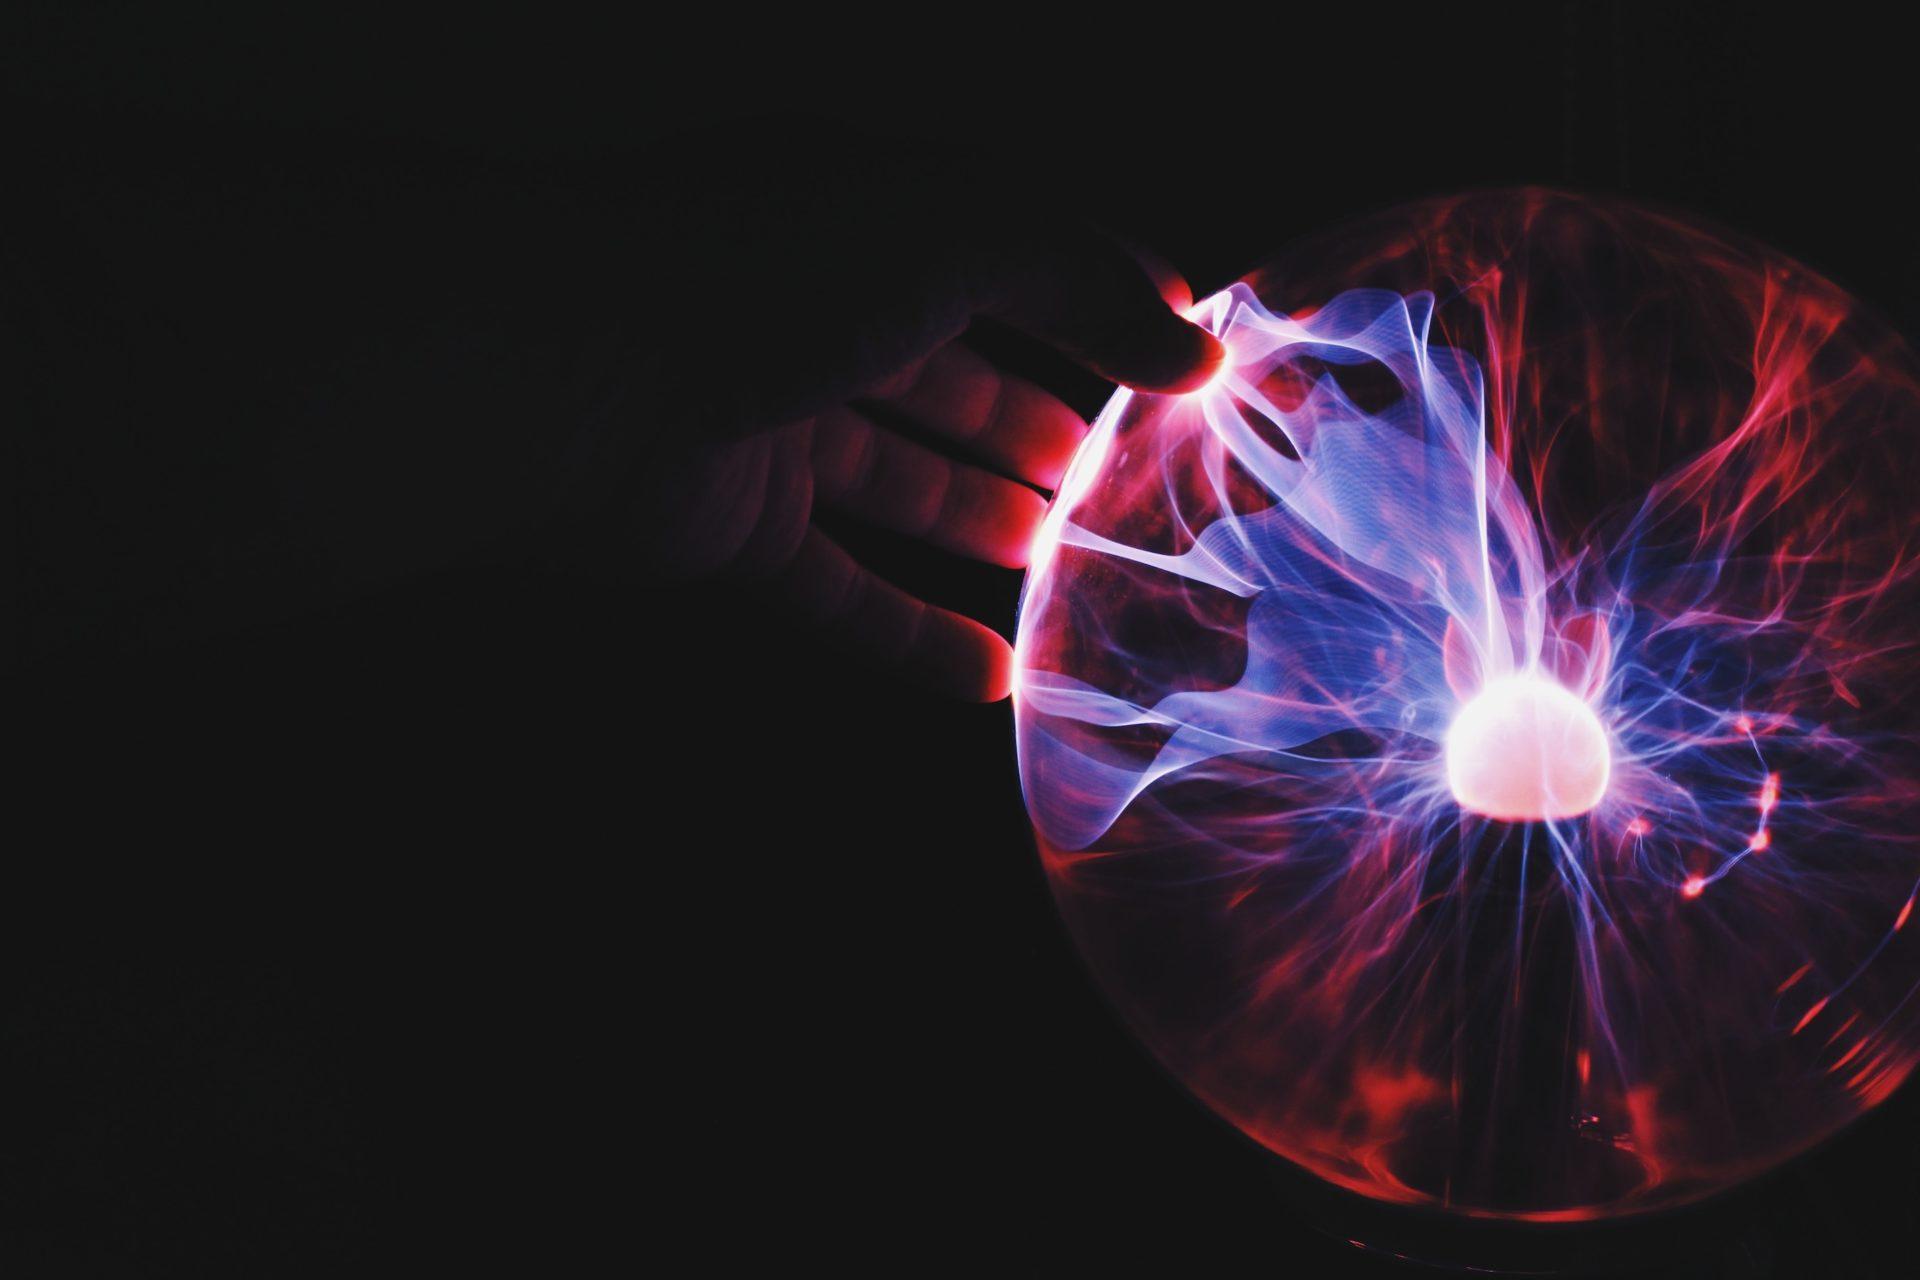 light bulb and hand